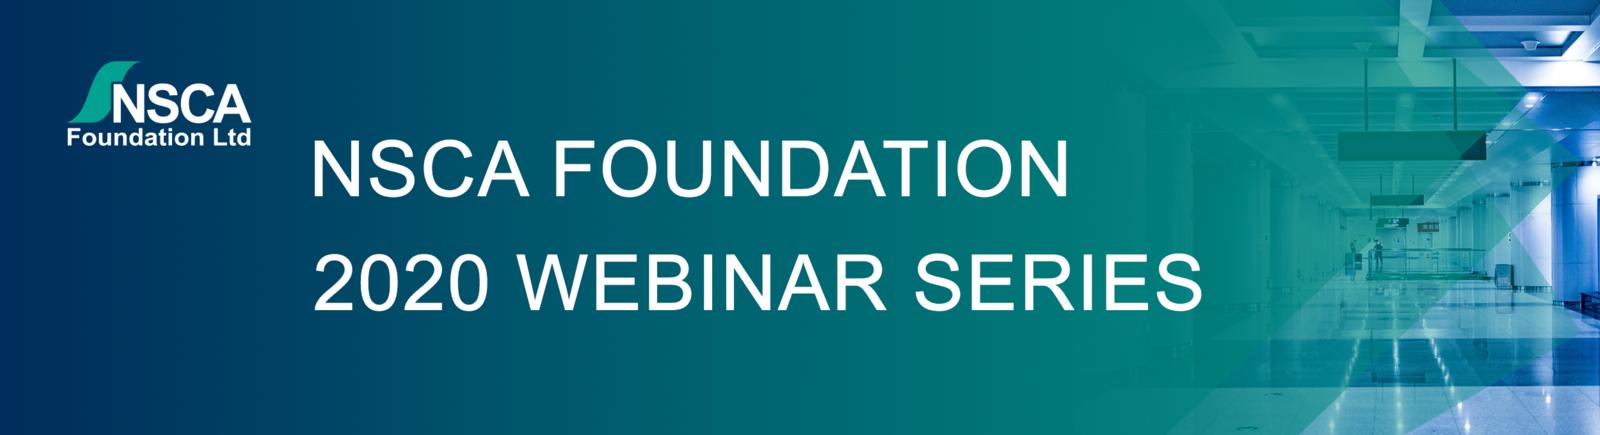 NSCA Foundation Webinar Series